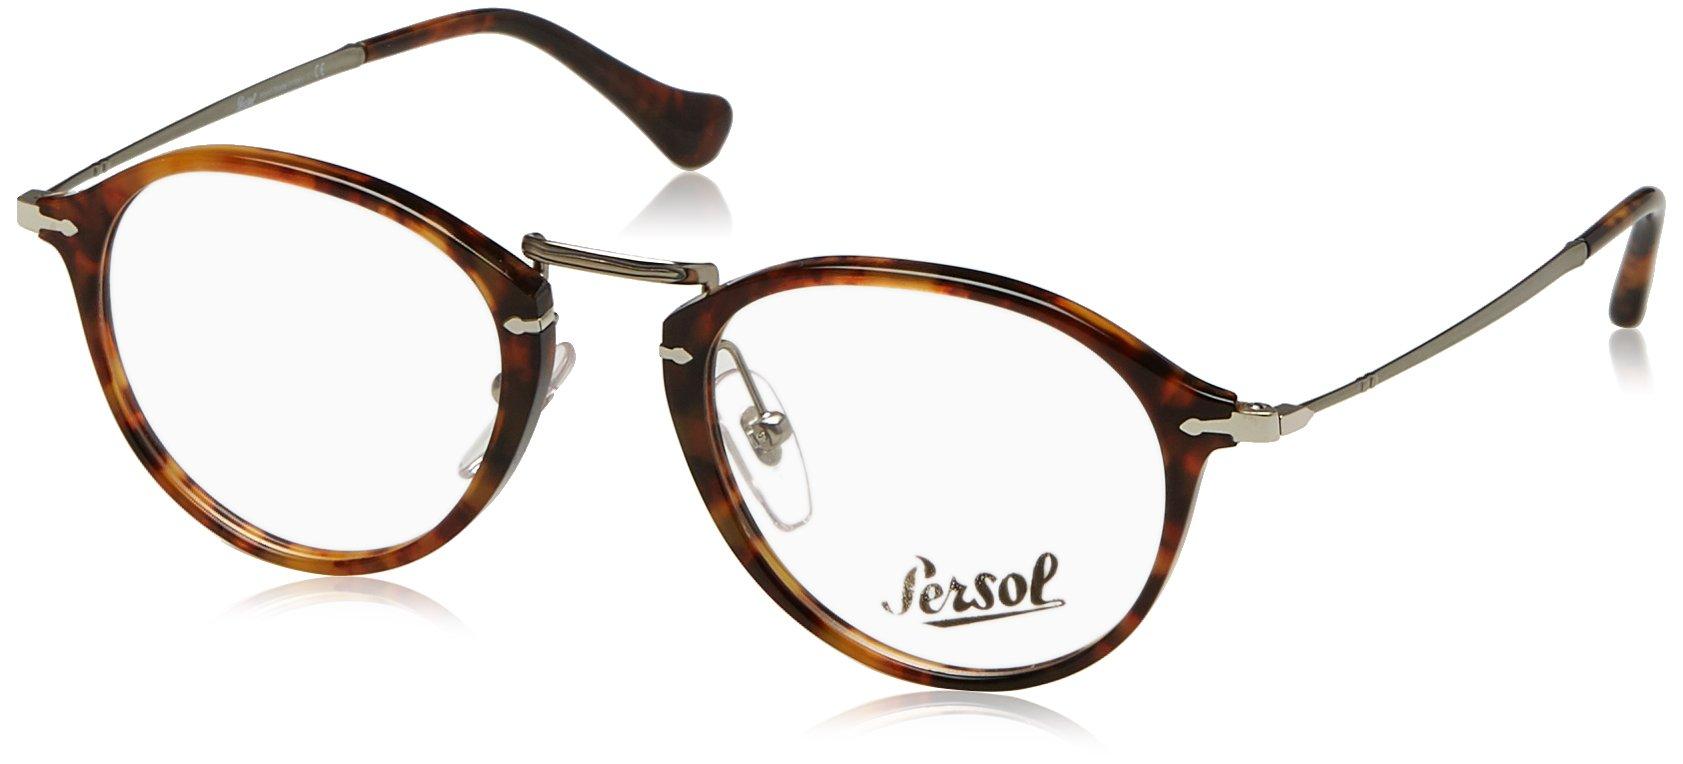 Persol PO3046V Eyeglass Frames 108-49 - Light Havana PO3046V-108-49